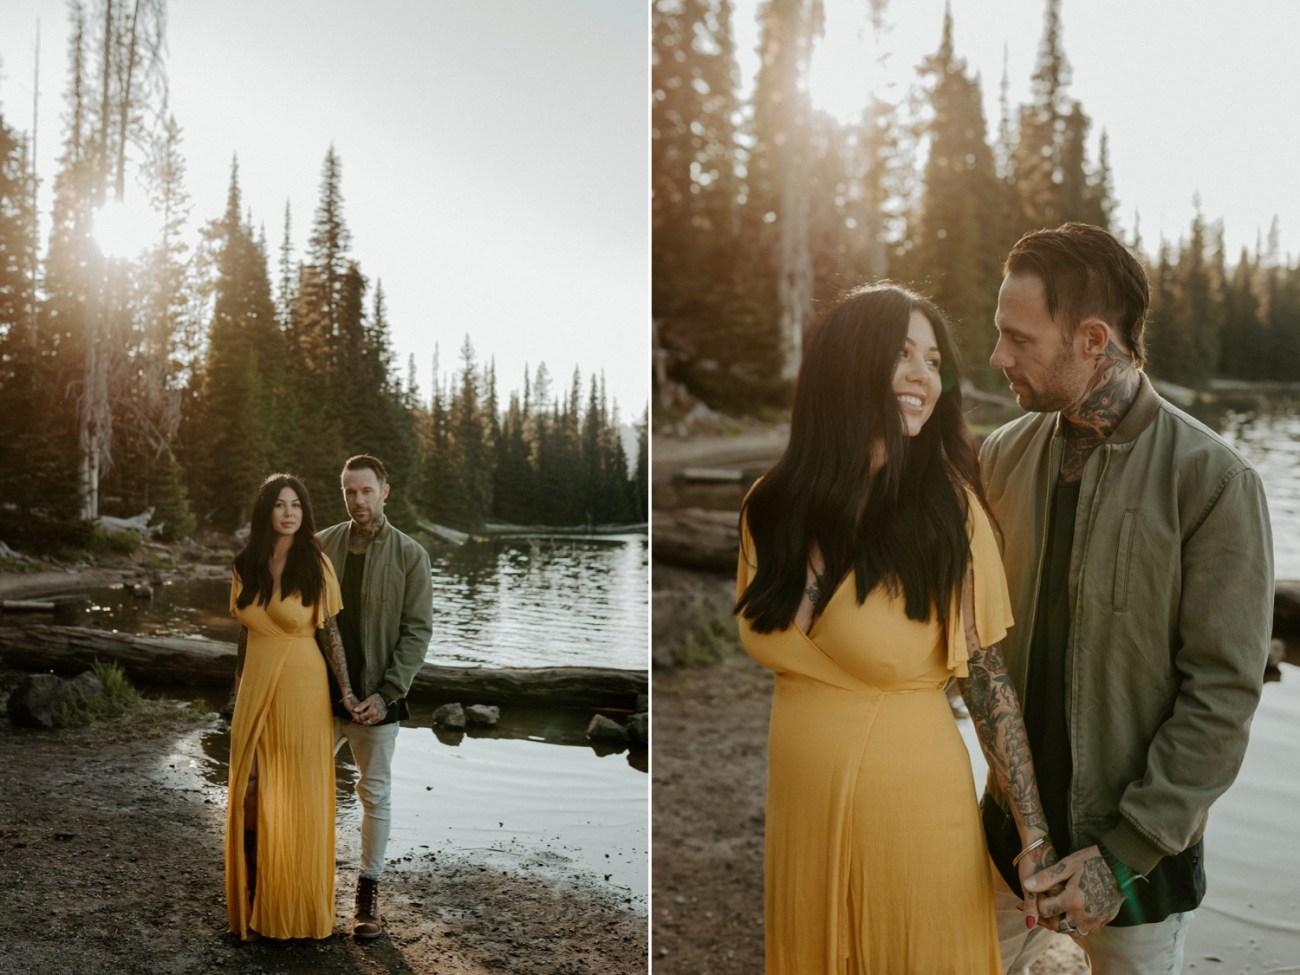 Sparks Lake Engagement Session Bend Oregon Elopement Bend Wedding Photographer Anais Possamai Photography 004